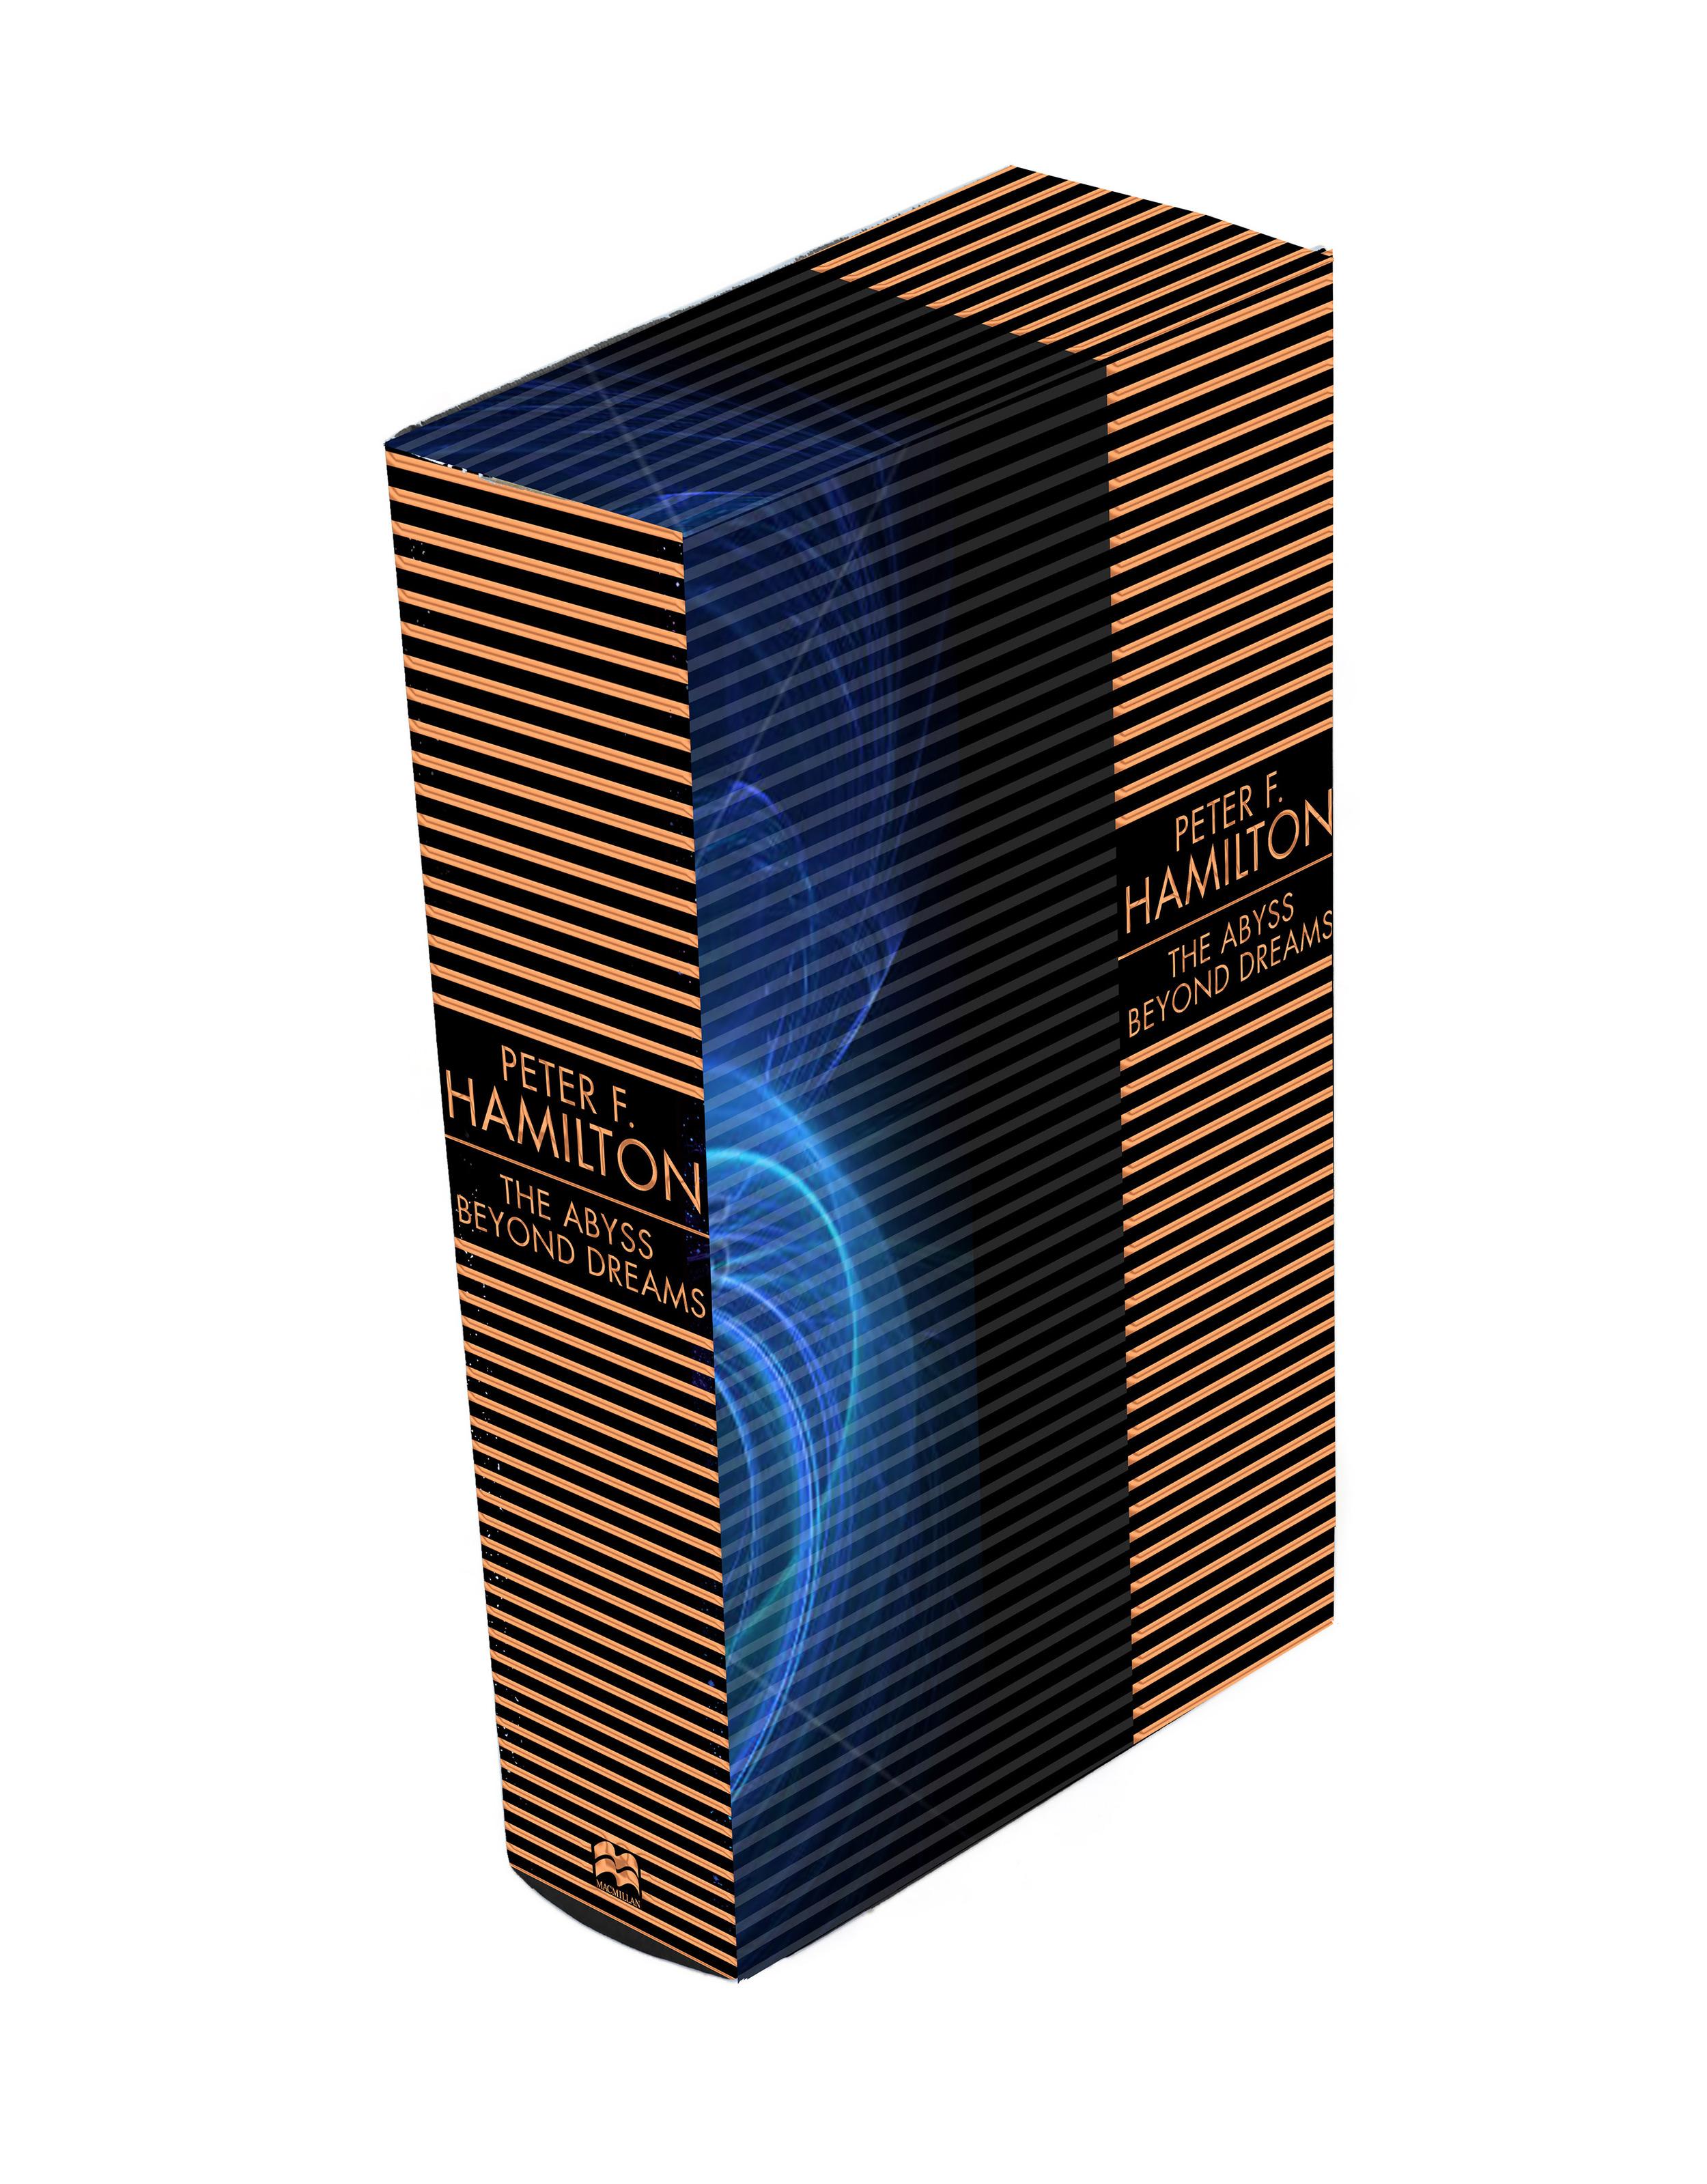 SLIPCASE + BOOK 2 (2)